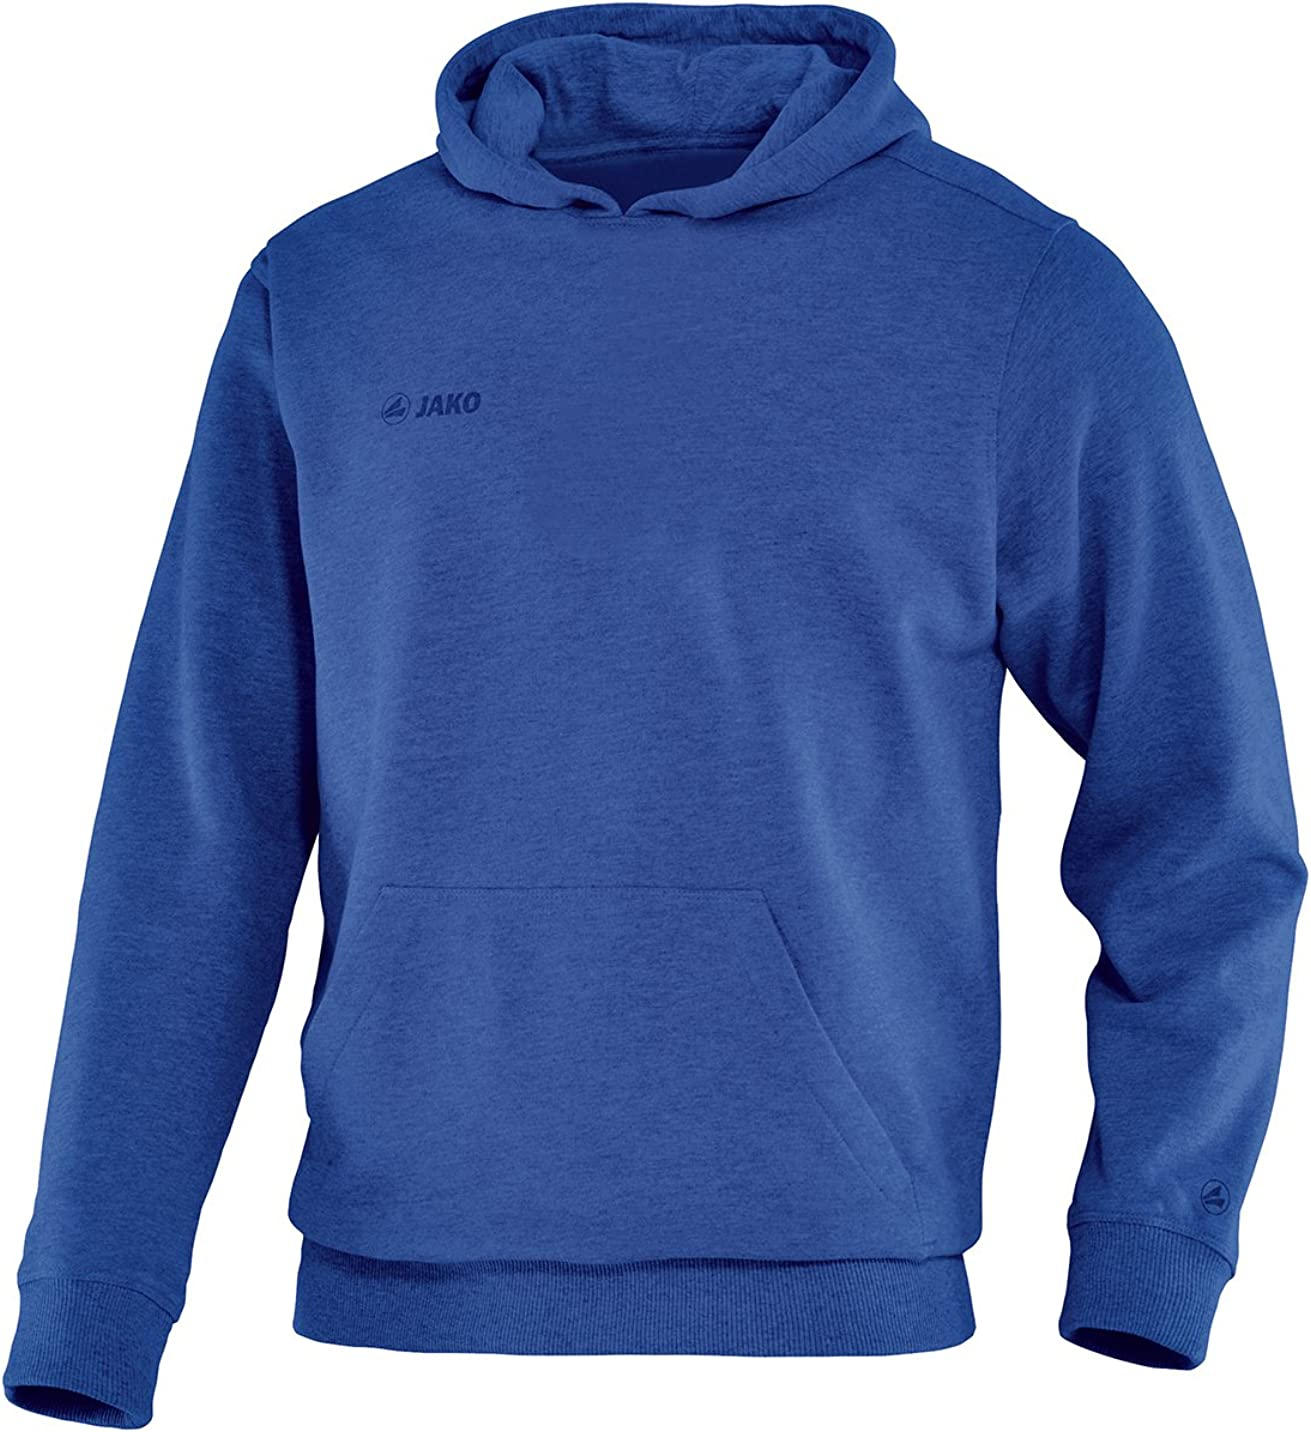 JAKO Kinder Kapuzensweat Shirt Classic